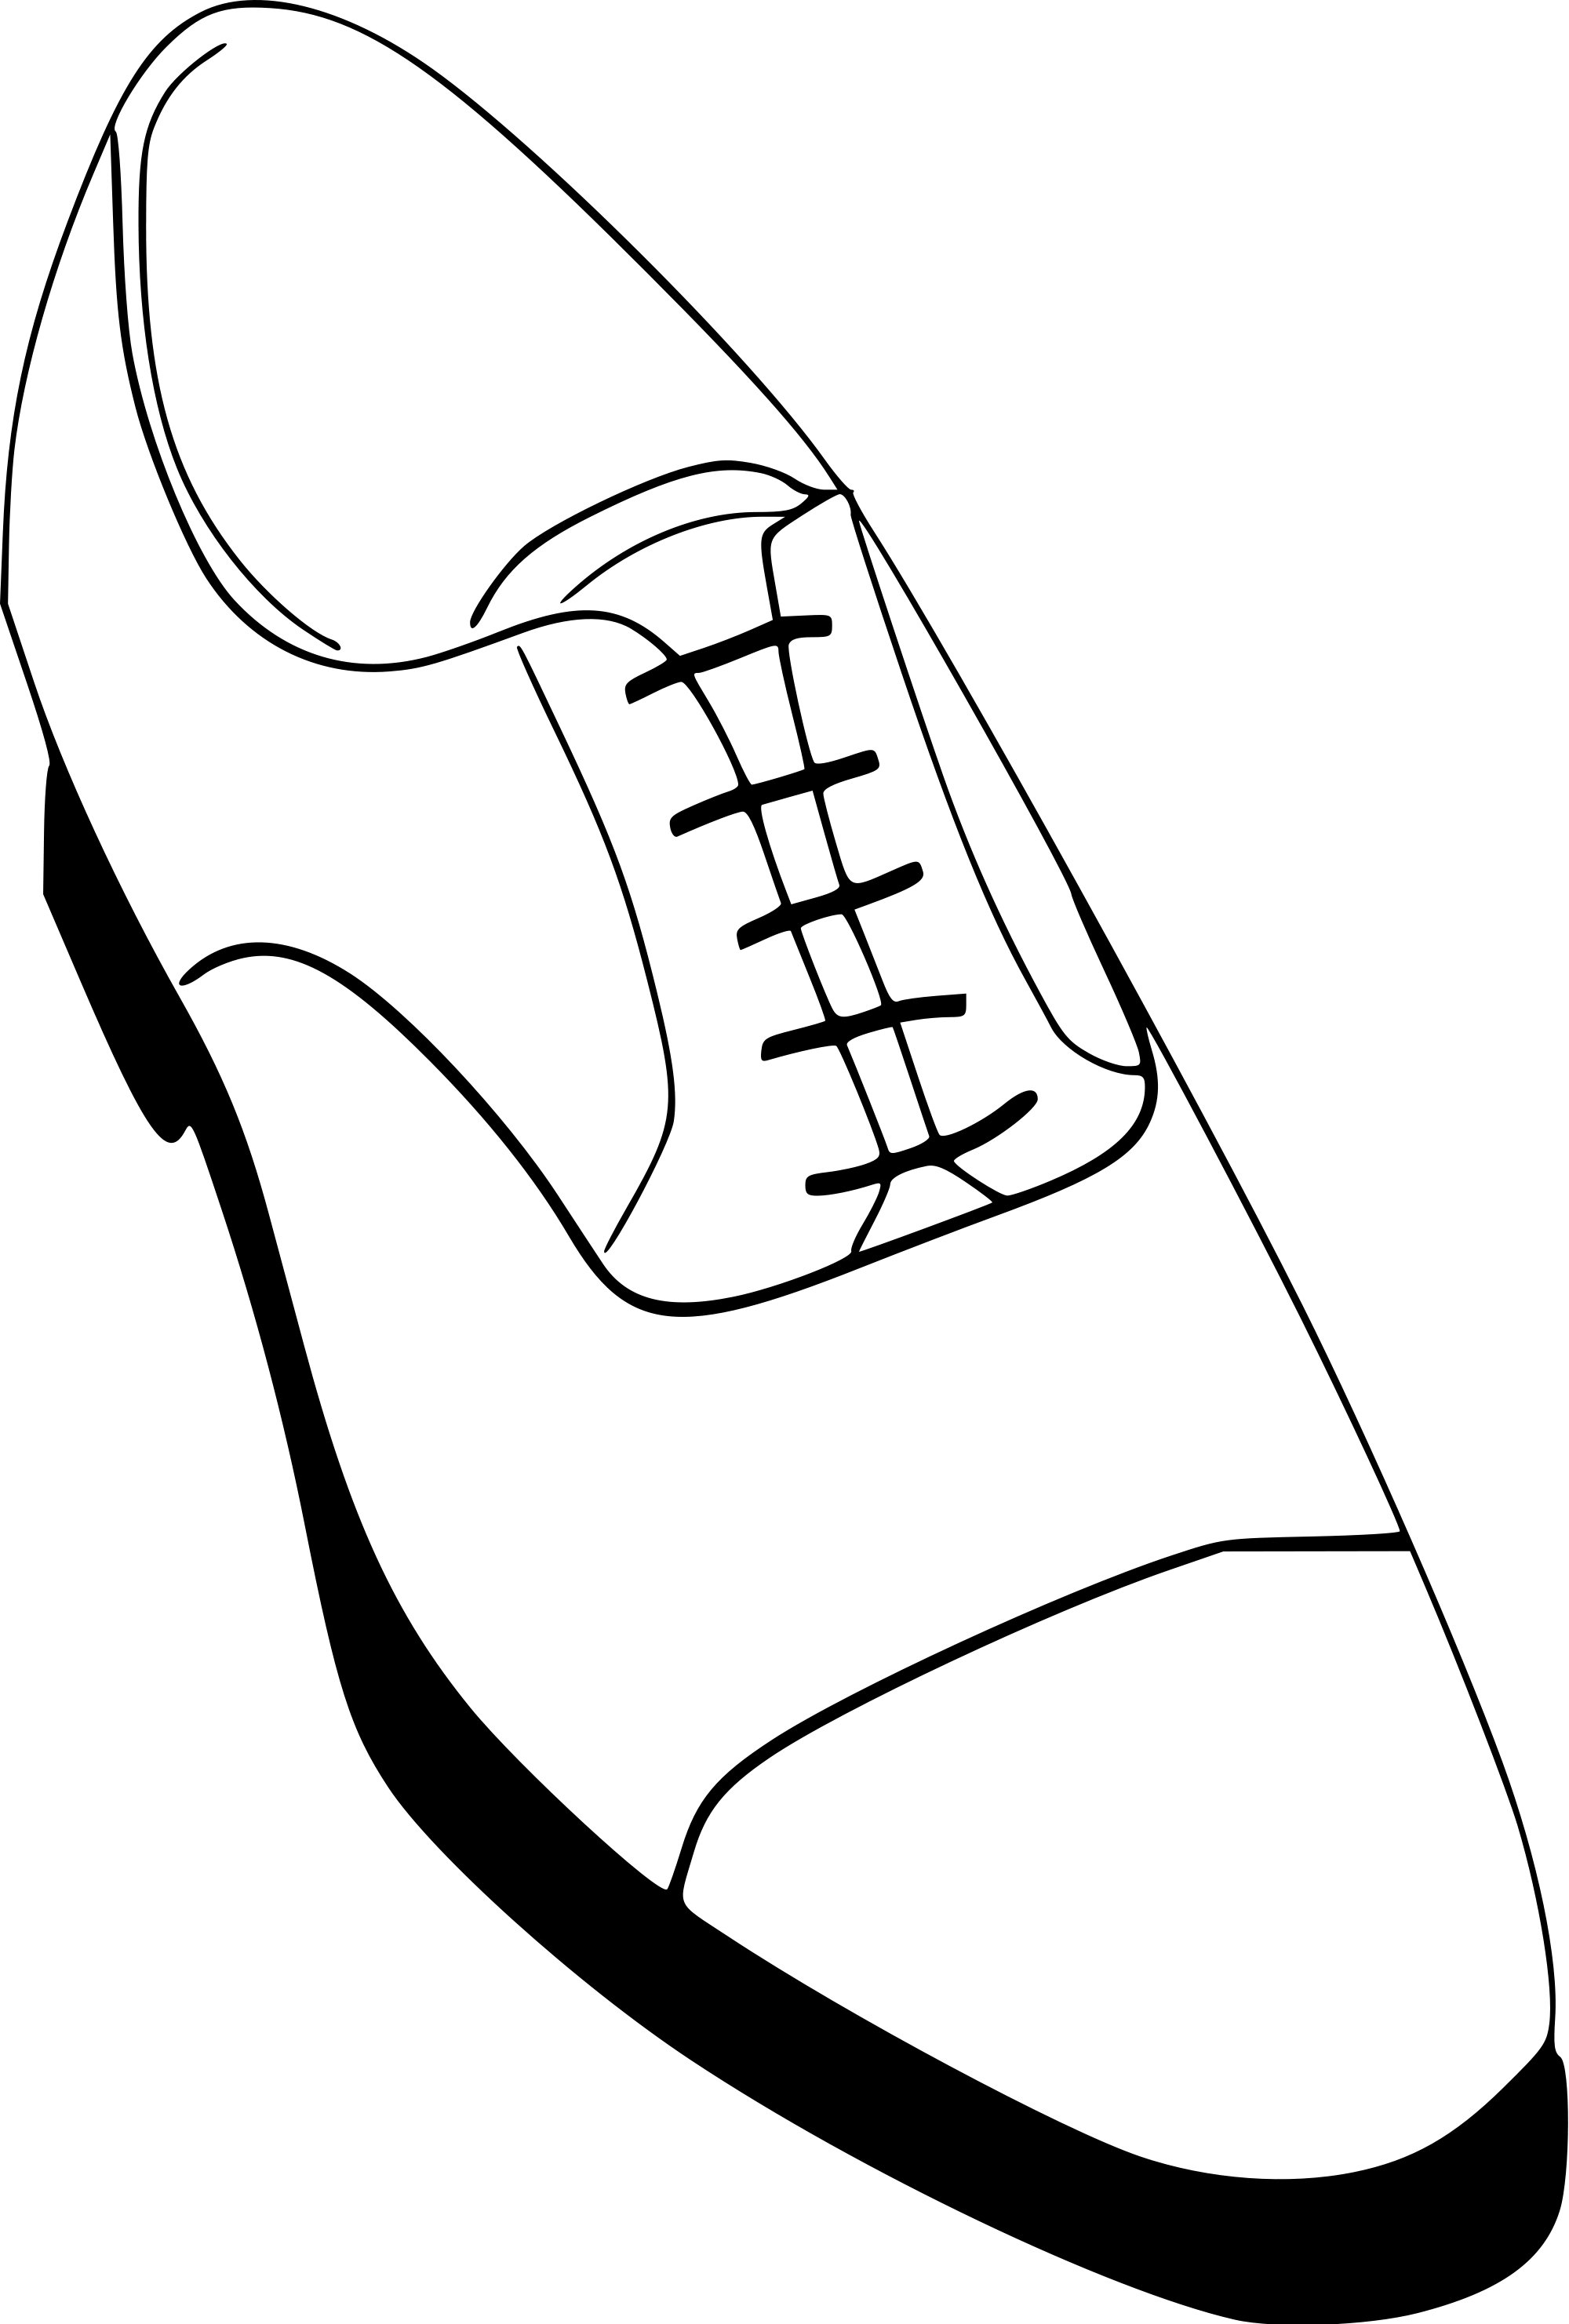 2000x2963 Fileoxfordskor.svg